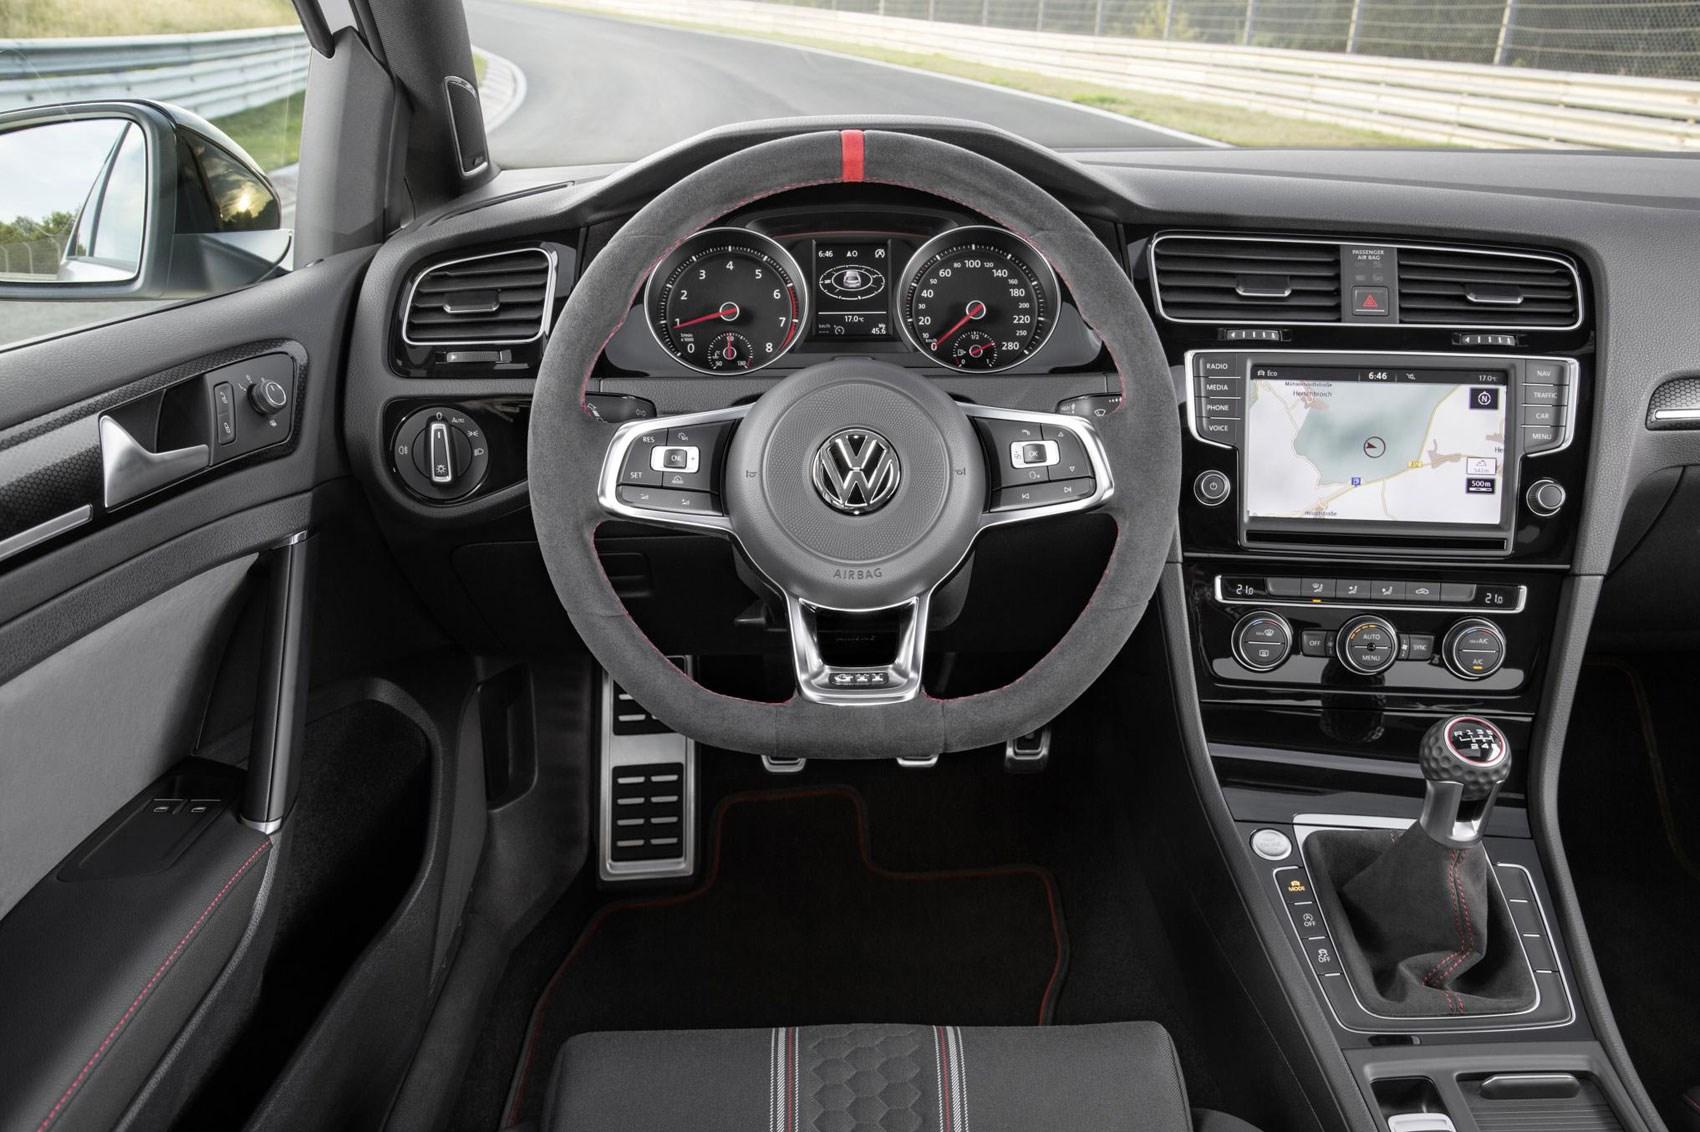 Volkswagen Golf GTI Clubsport Dashboard and Head Unit Panels